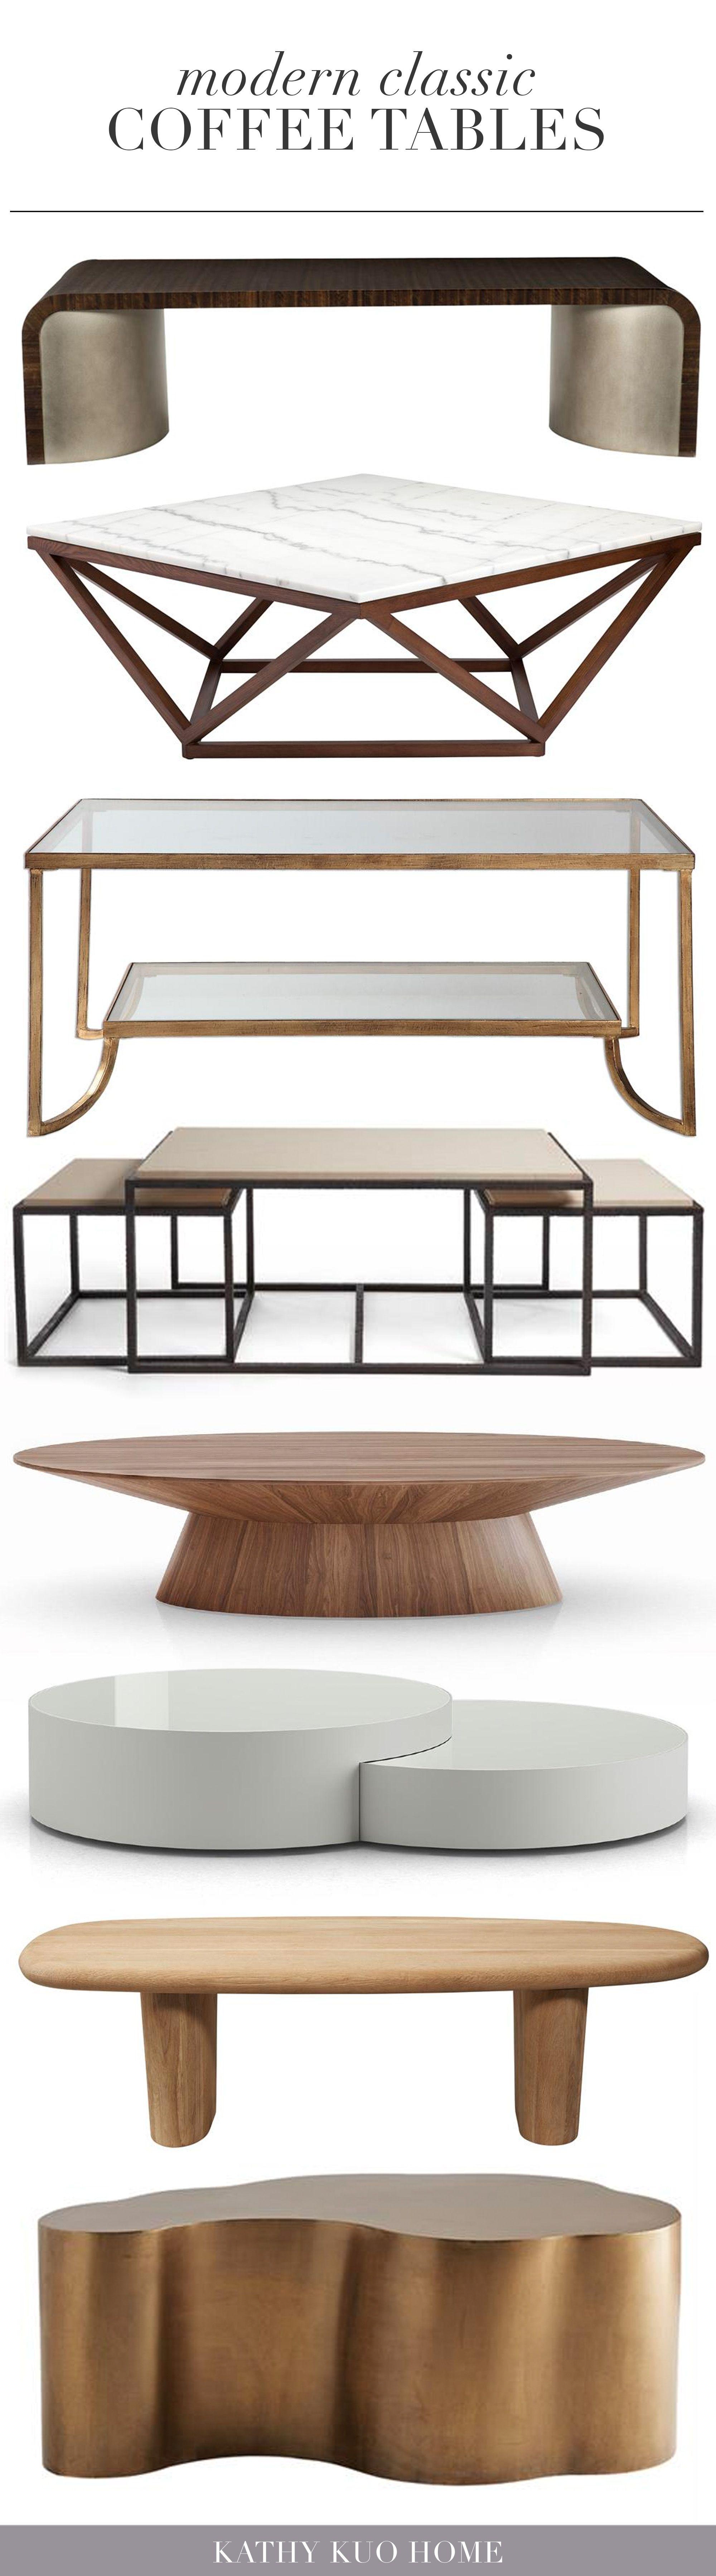 Modern Coffee Tables Kathy Kuo Home Coffee Table Table Style Coffee Table Styling [ 7198 x 2000 Pixel ]